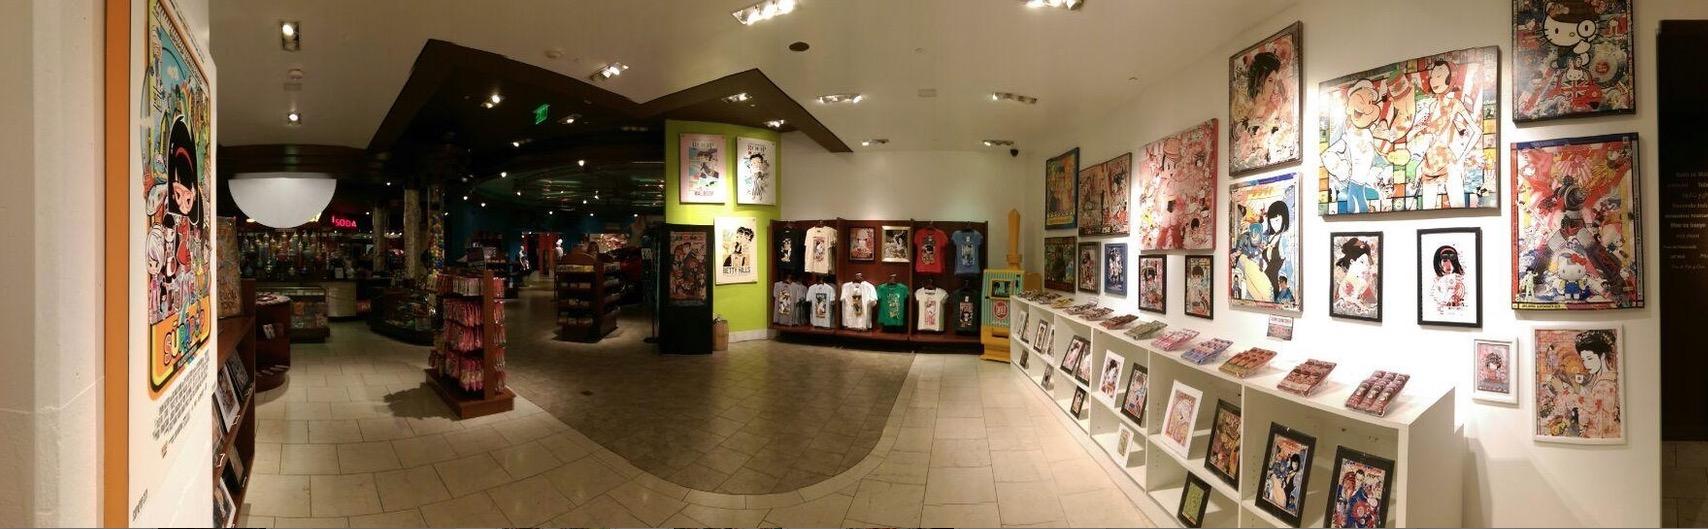 SupaPop Boutique, Hollywood + Highland Center